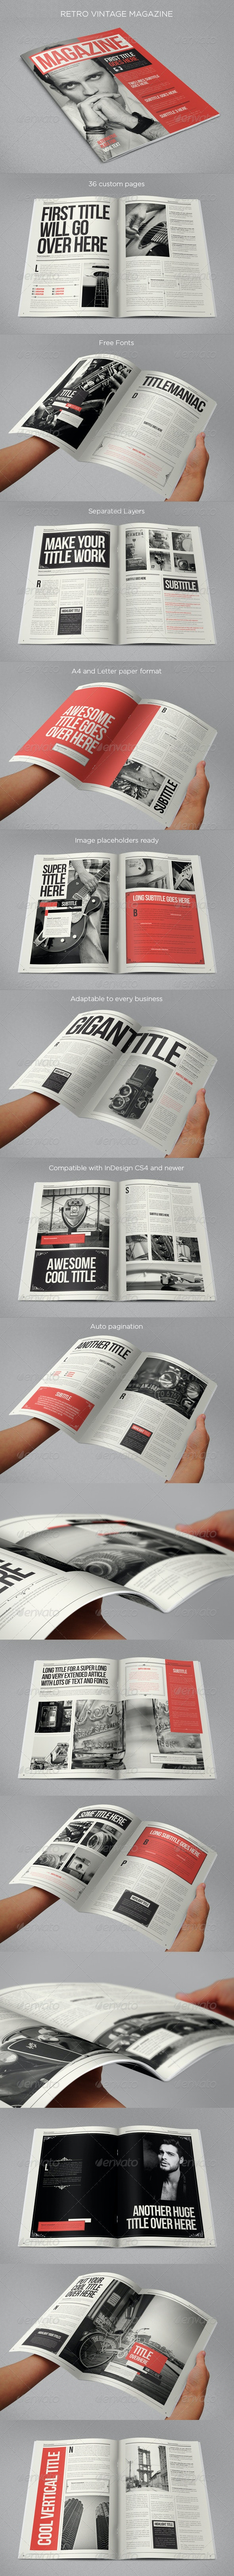 Retro Vintage Magazine - Magazines Print Templates